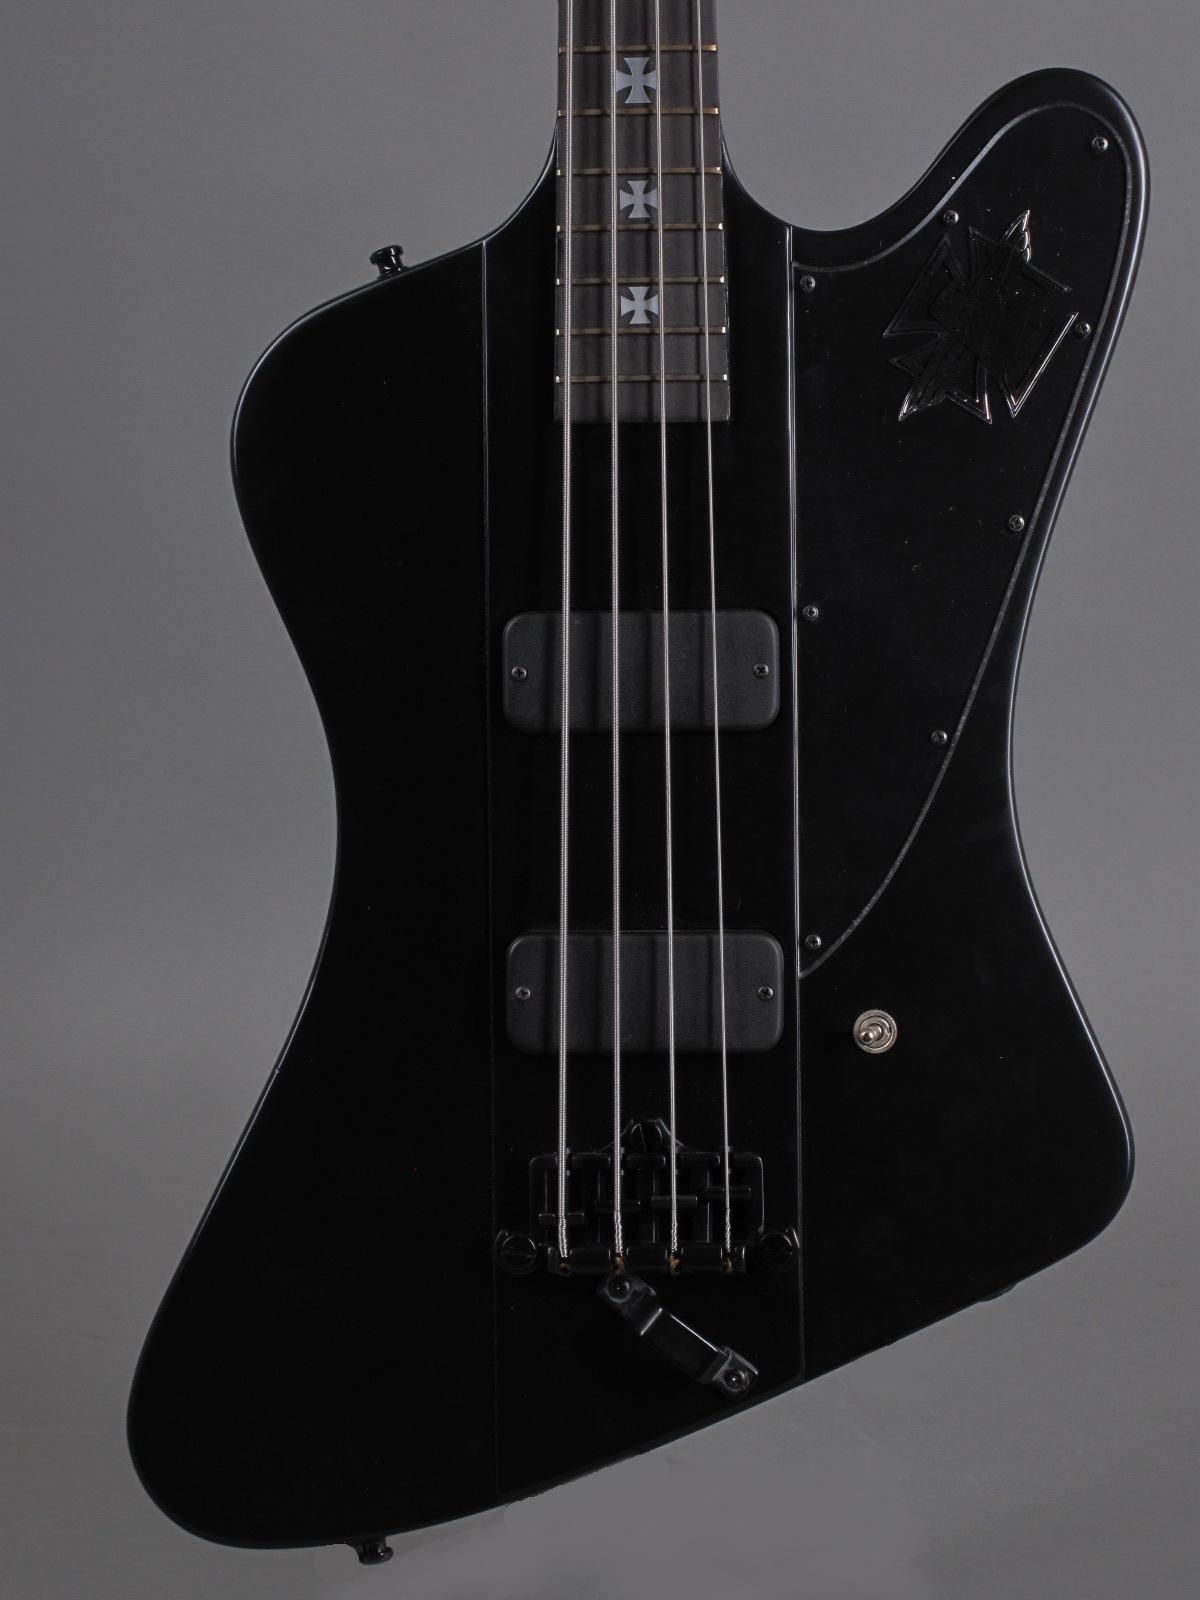 2001 Gibson Nikki Sixx Signature Blackbird Bass - Flat Black